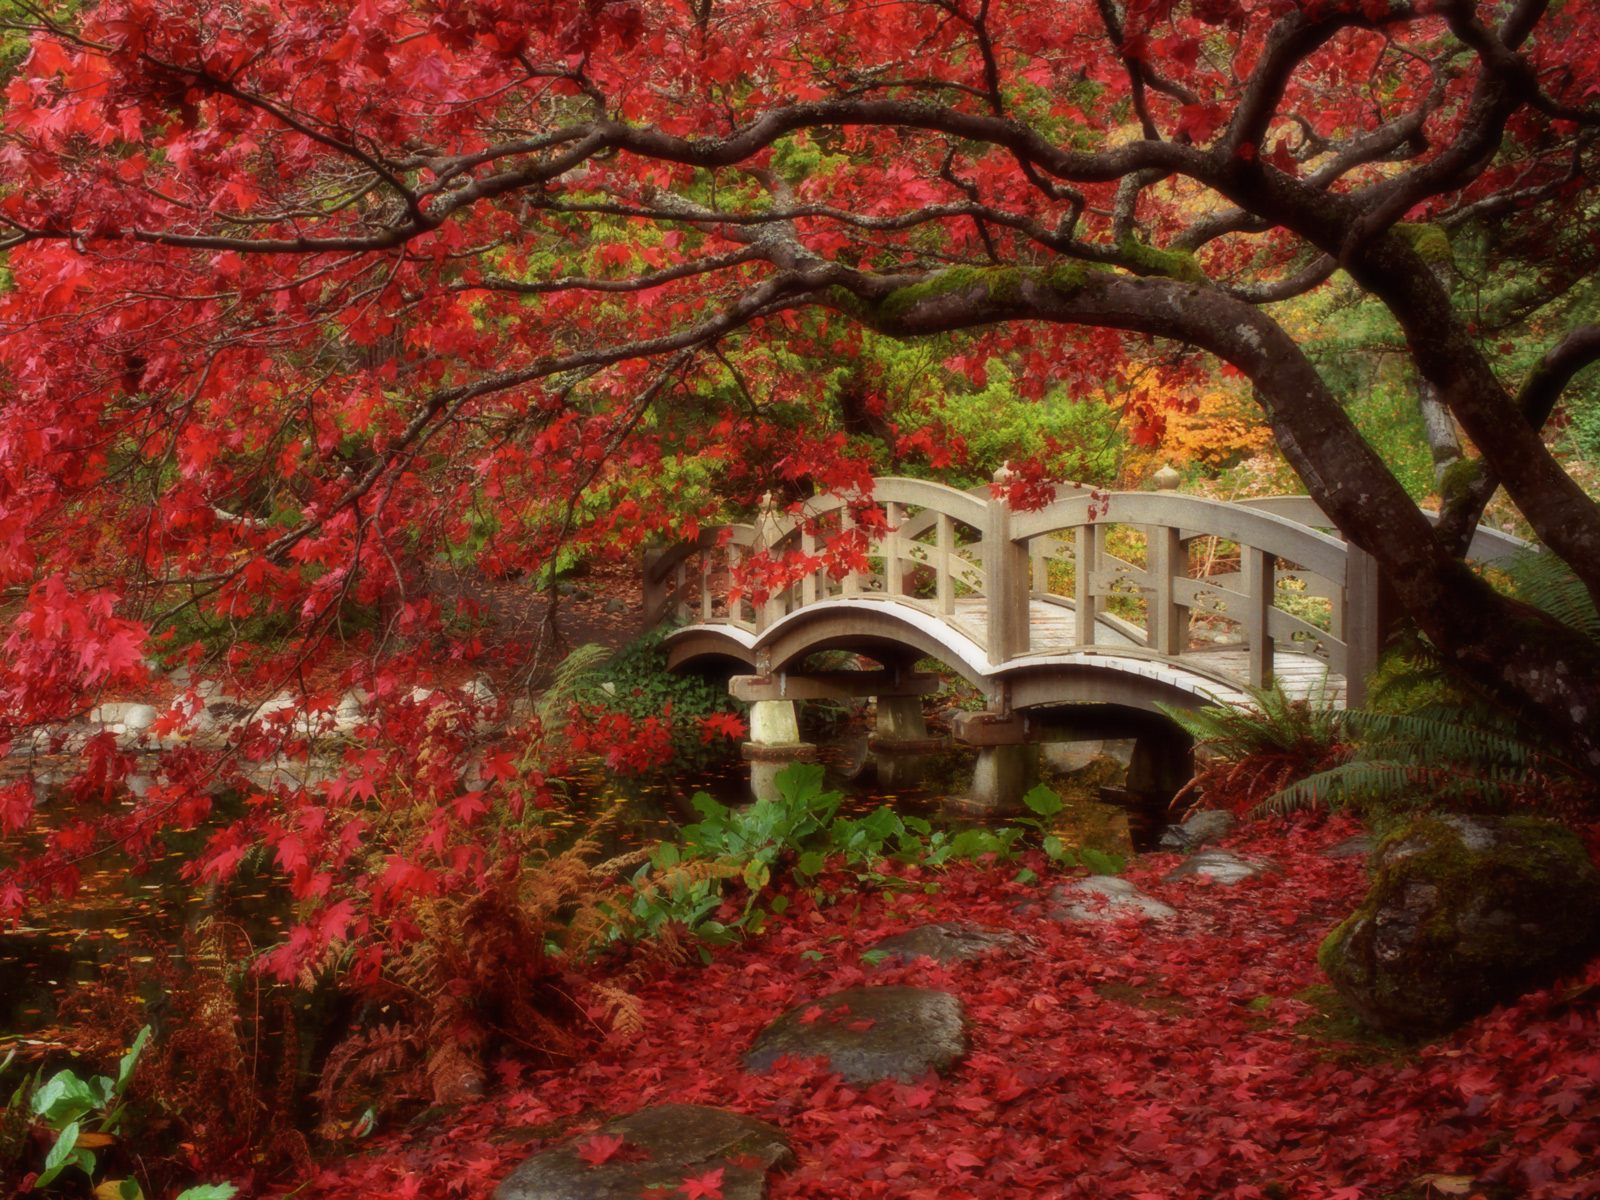 Japanese Garden British Columbia Wallpapers HD Wallpapers 1600x1200